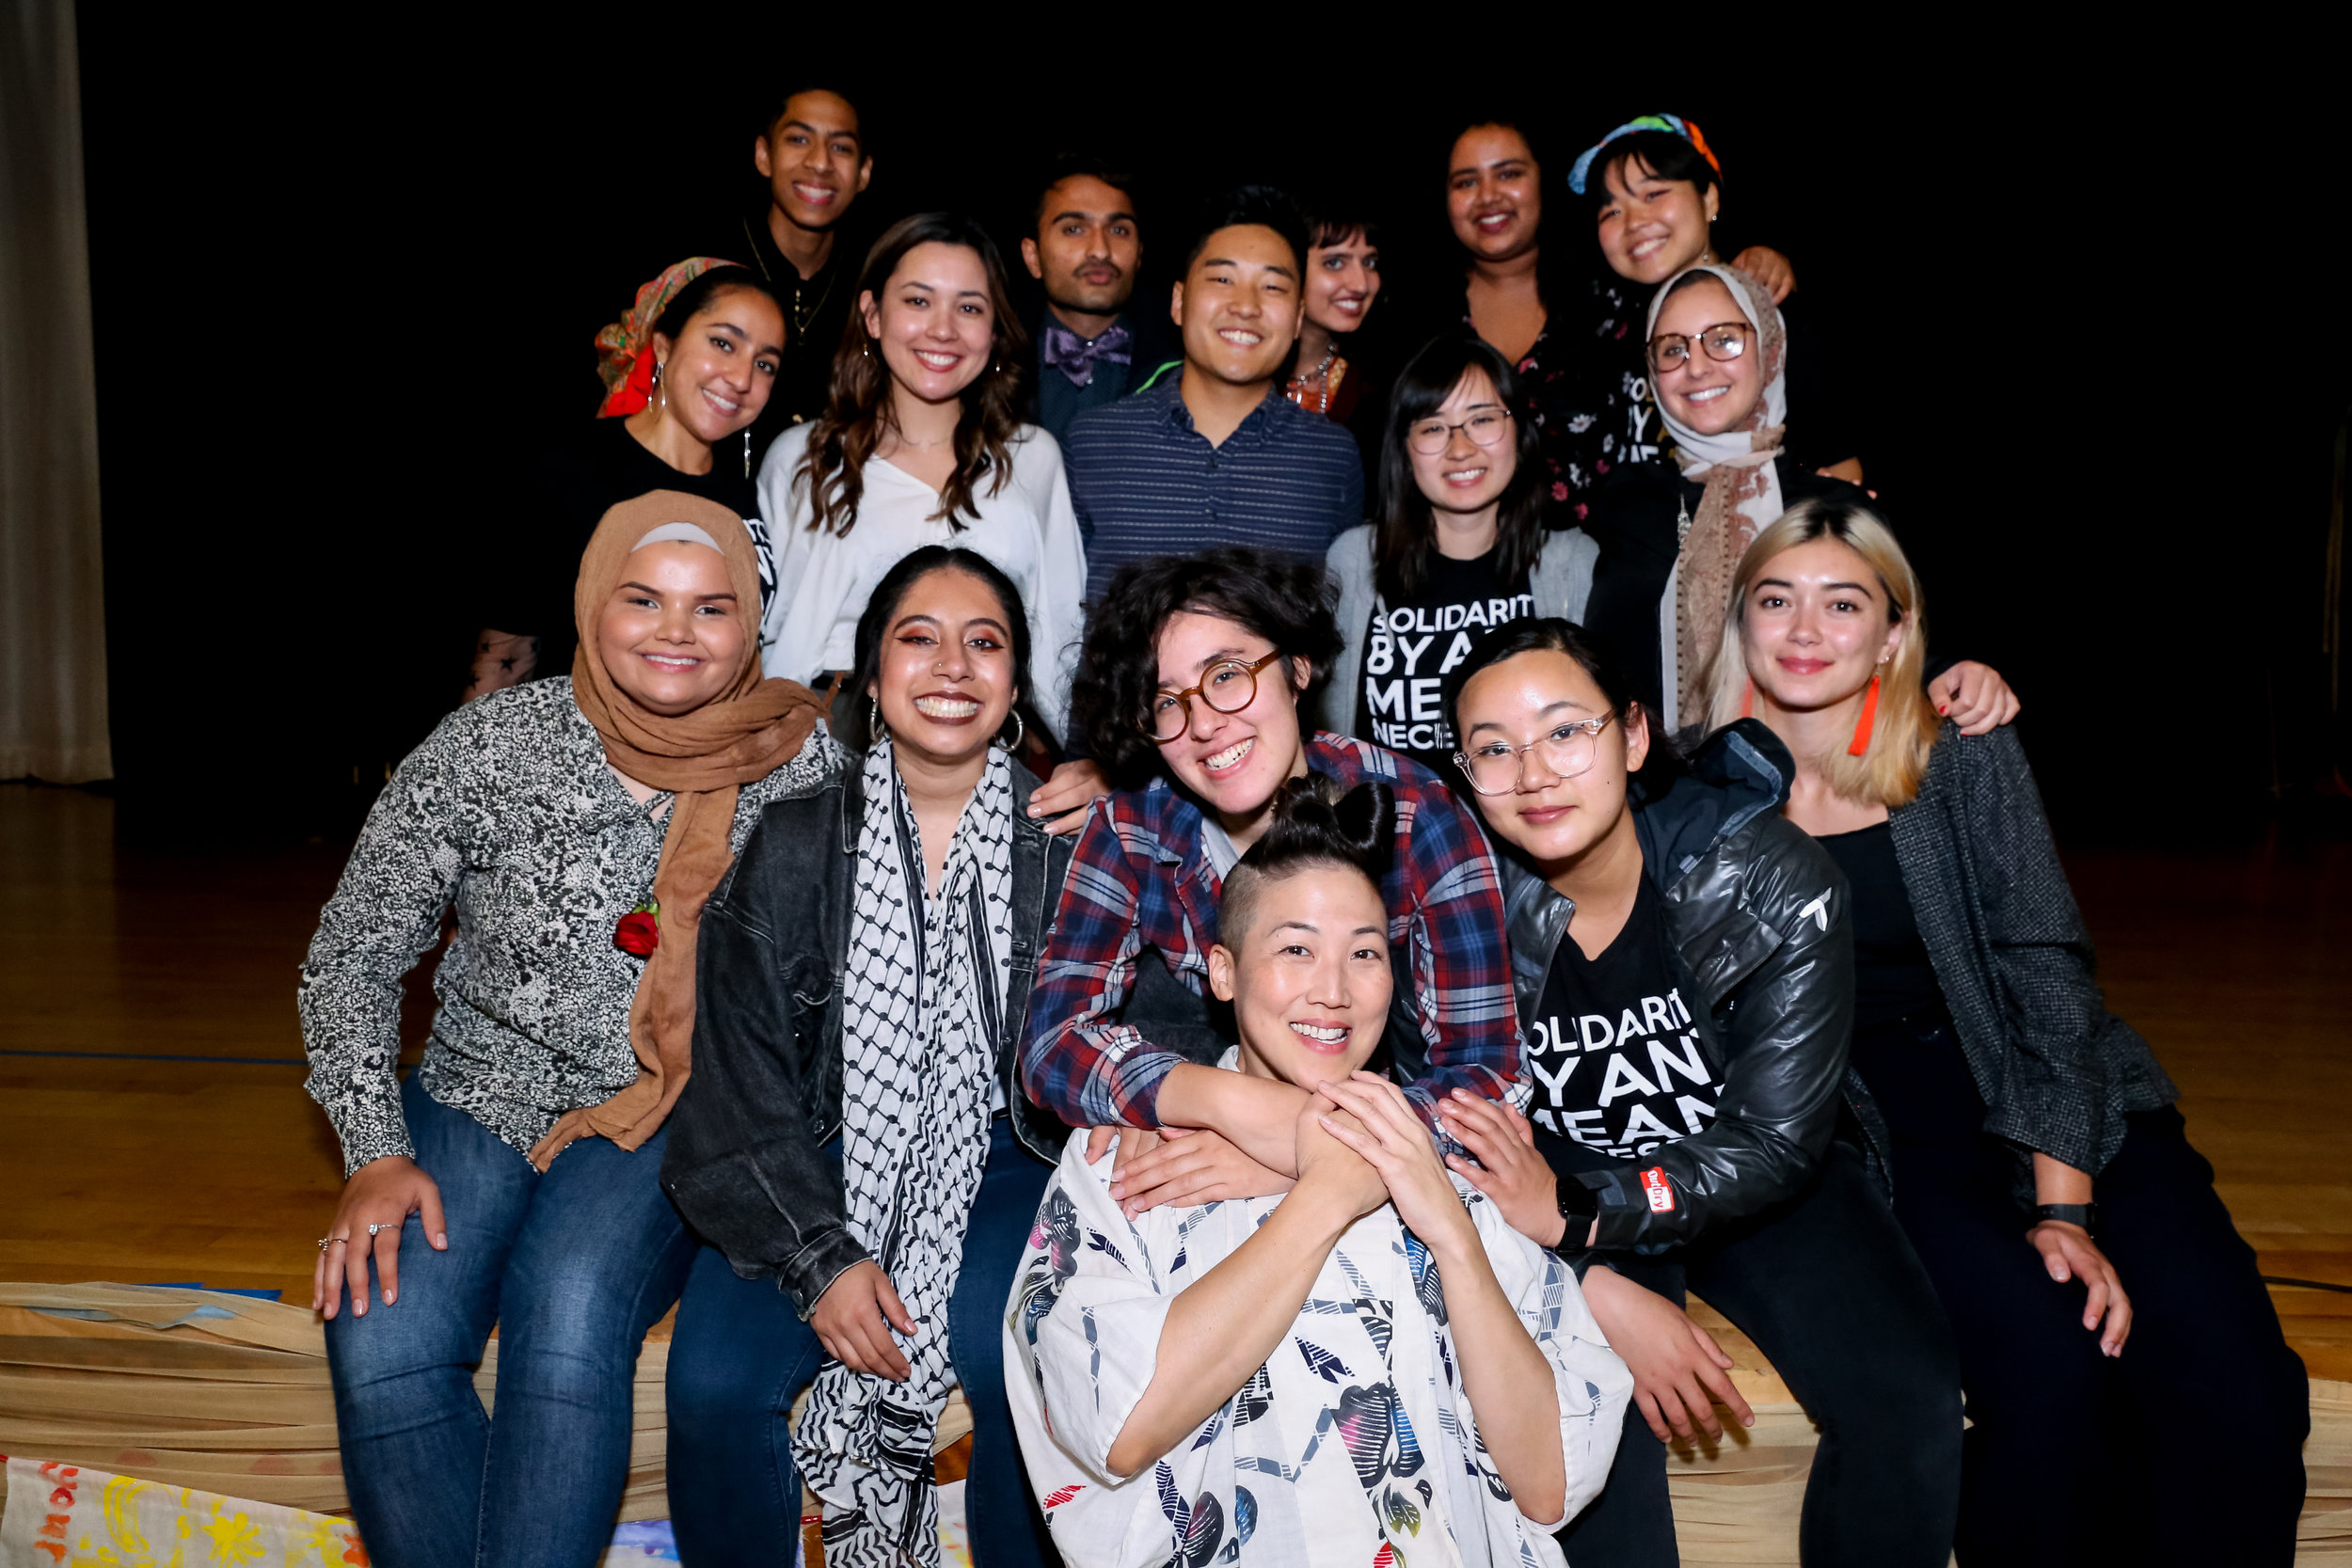 Our 2019 Solidarity Arts Fellowship cohort at Vigilant Love's 2019 Bridging Communities Iftar.